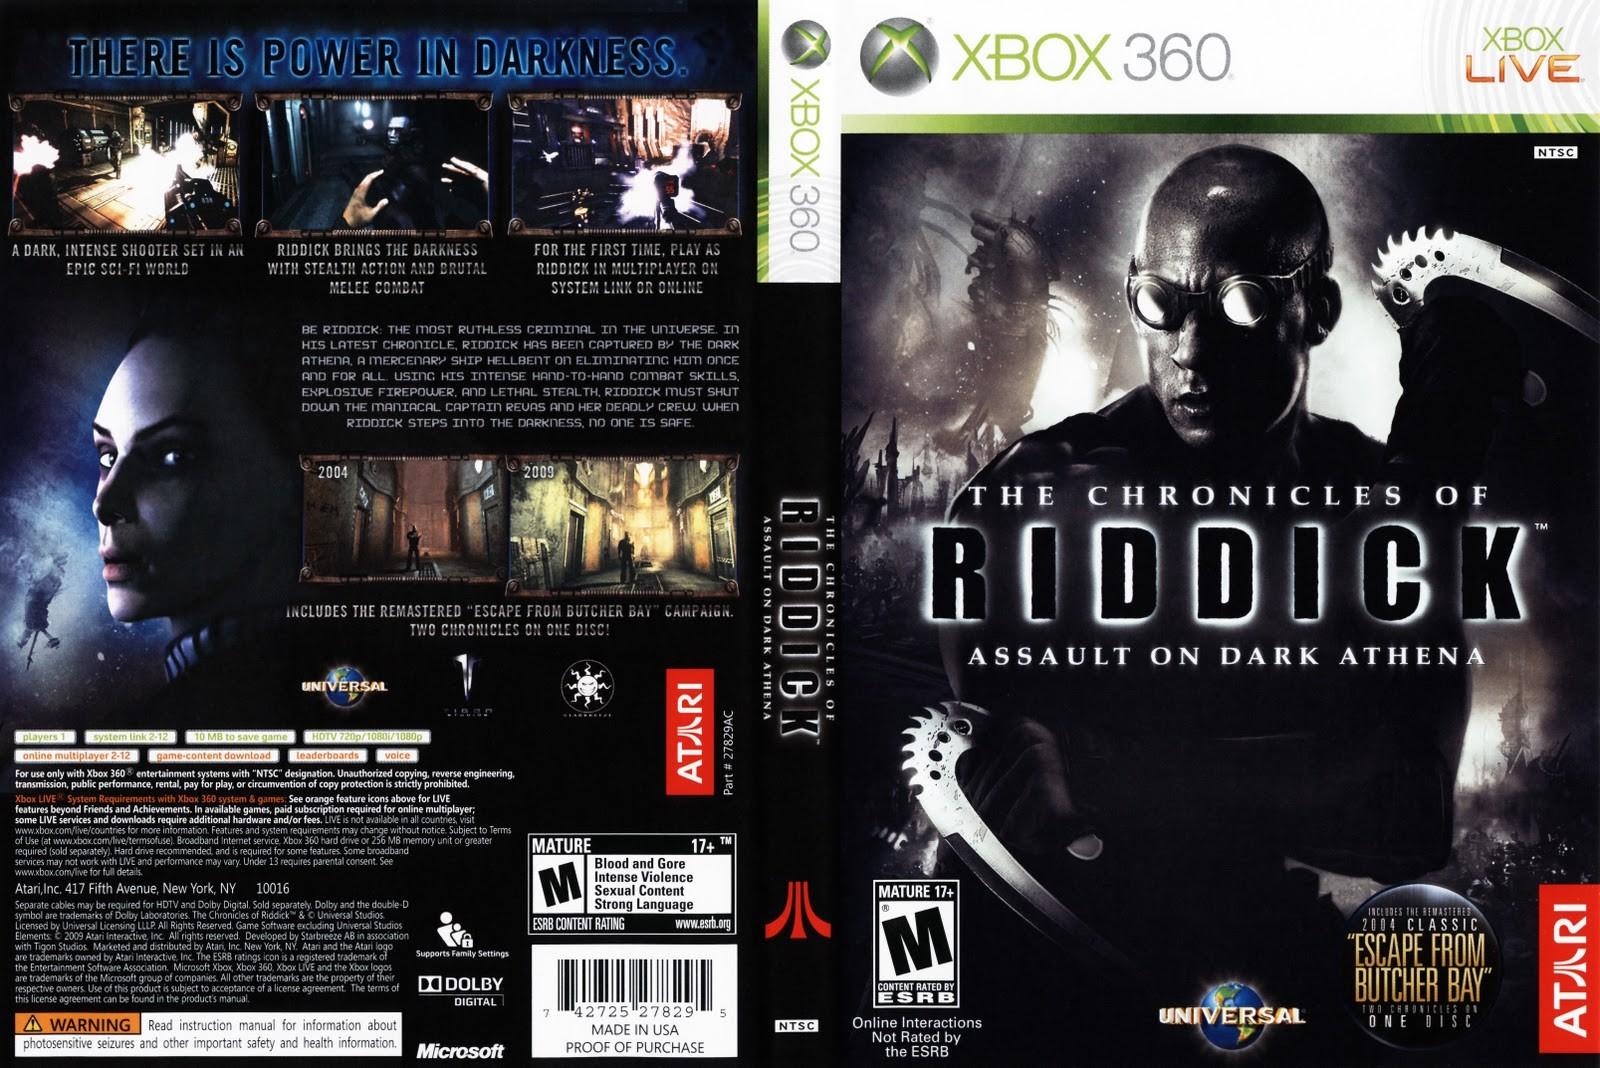 The Chronicles of Riddick Assault on Dark Athena Xbox 360 Oyun İndir [MEGA  FULL ISO PAL] | PC|PS3|PS4|PSP|PSViTA|XBOX360 FULL OYUN İNDİRME SİTESİ